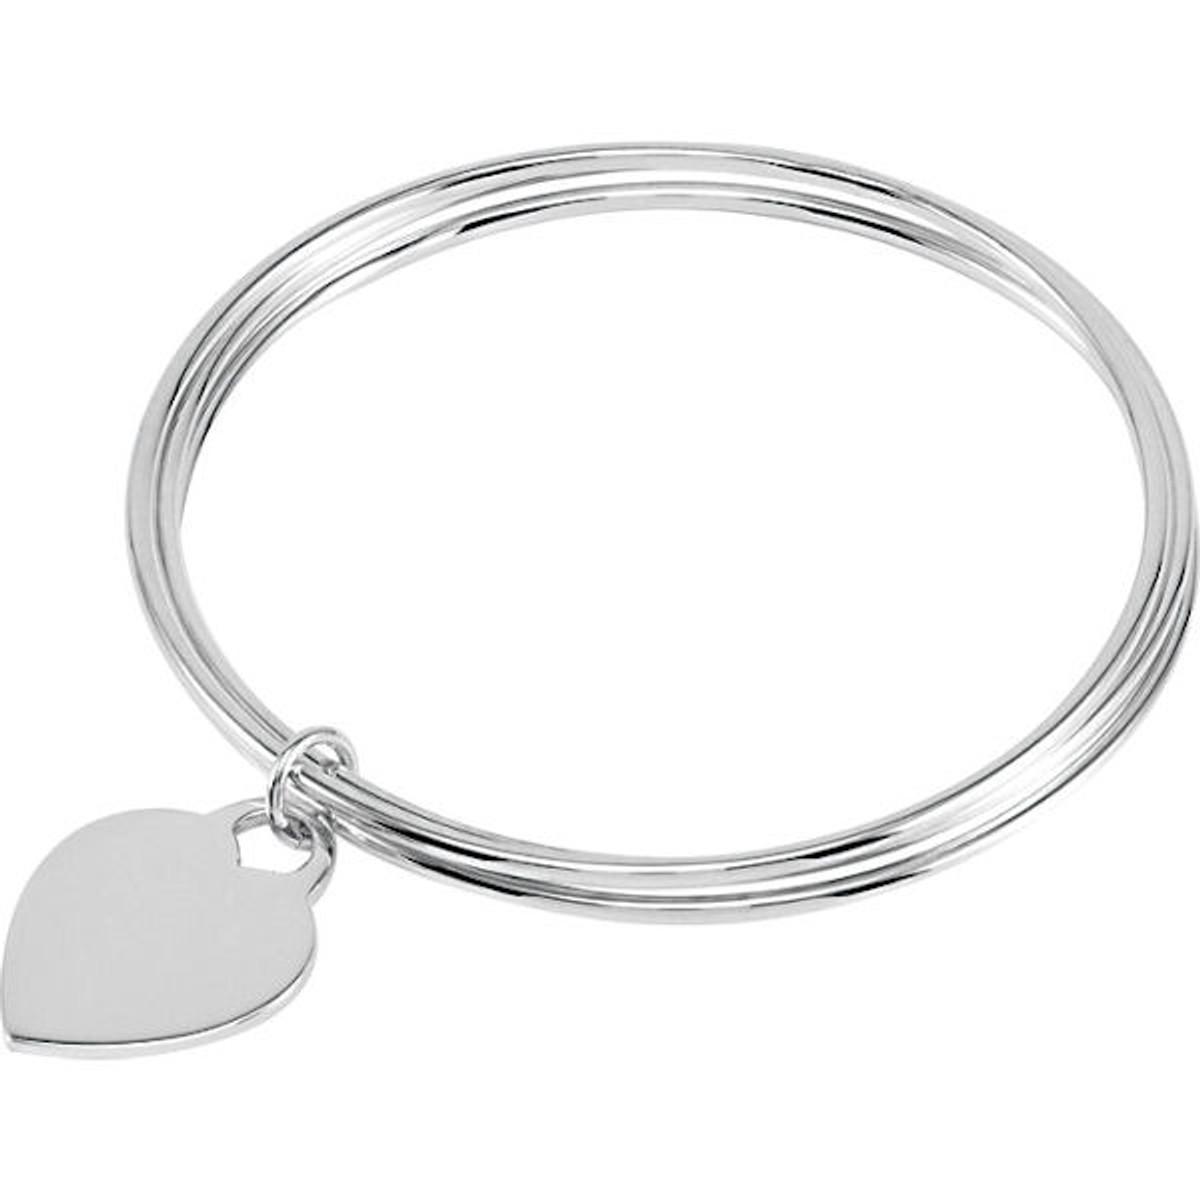 Sterling Silver Triple Bangle Bracelet